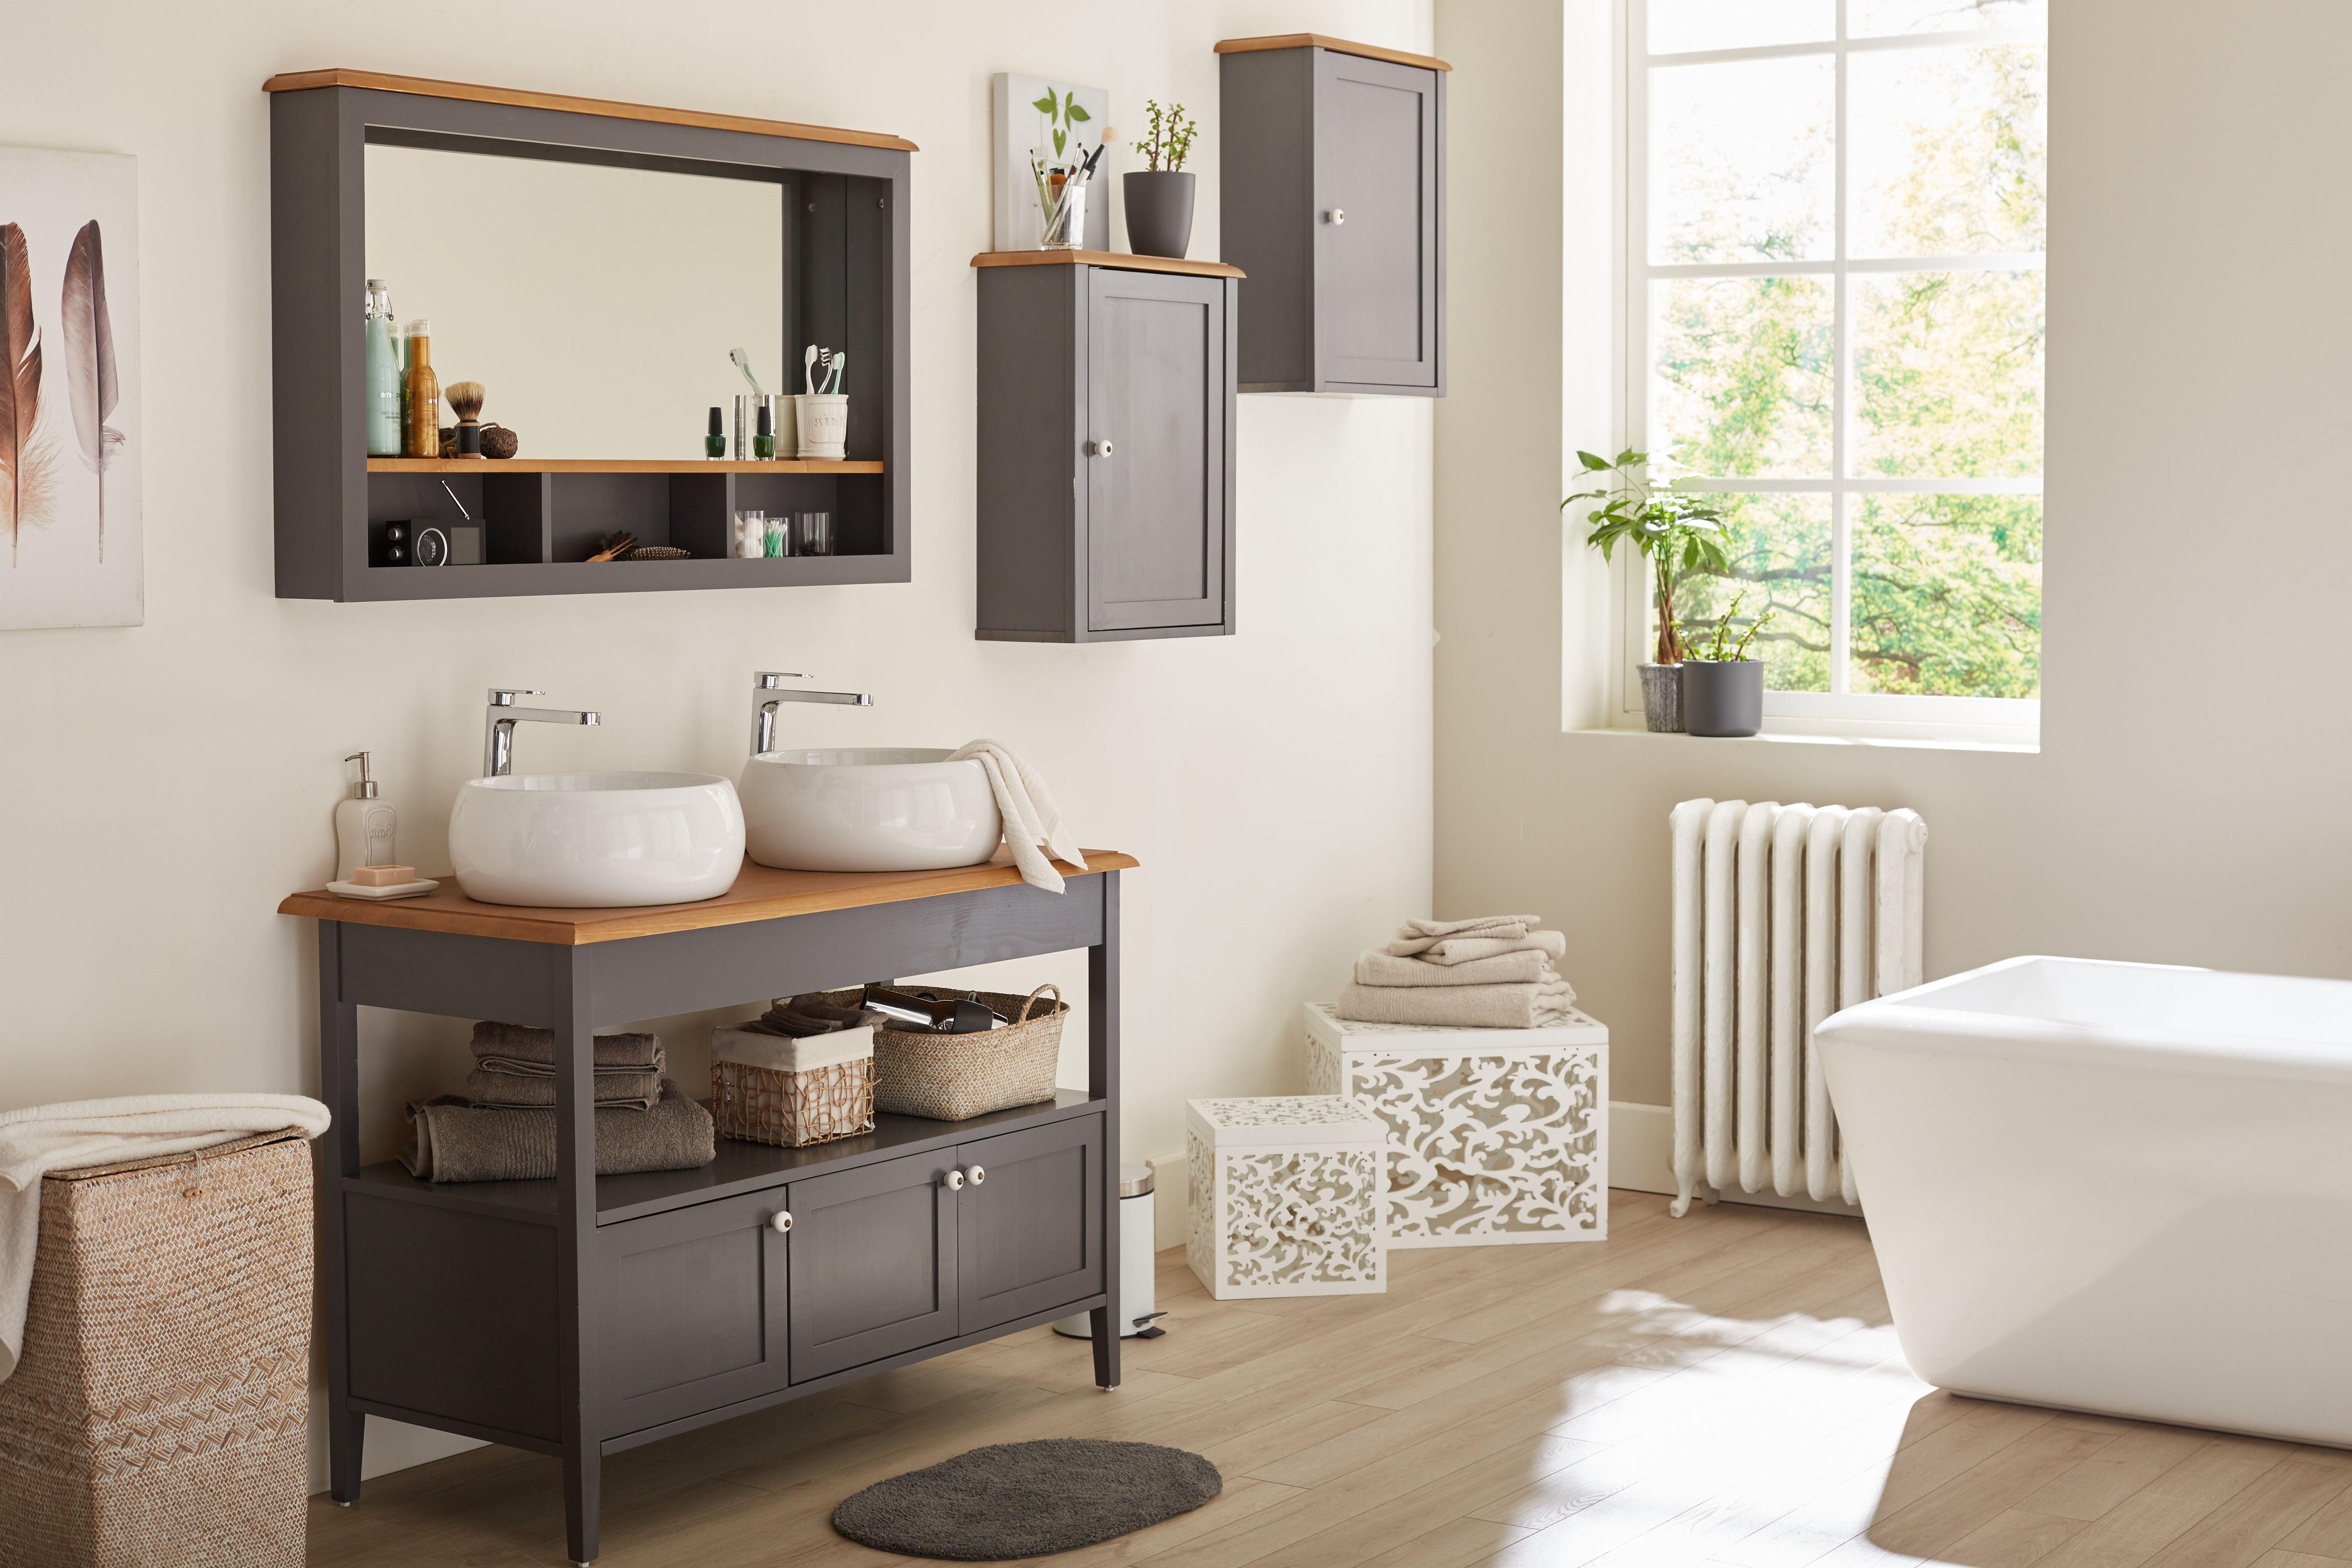 Kaolin Idee De Deco Pour Une Salle De Bain Alinea Home Decor